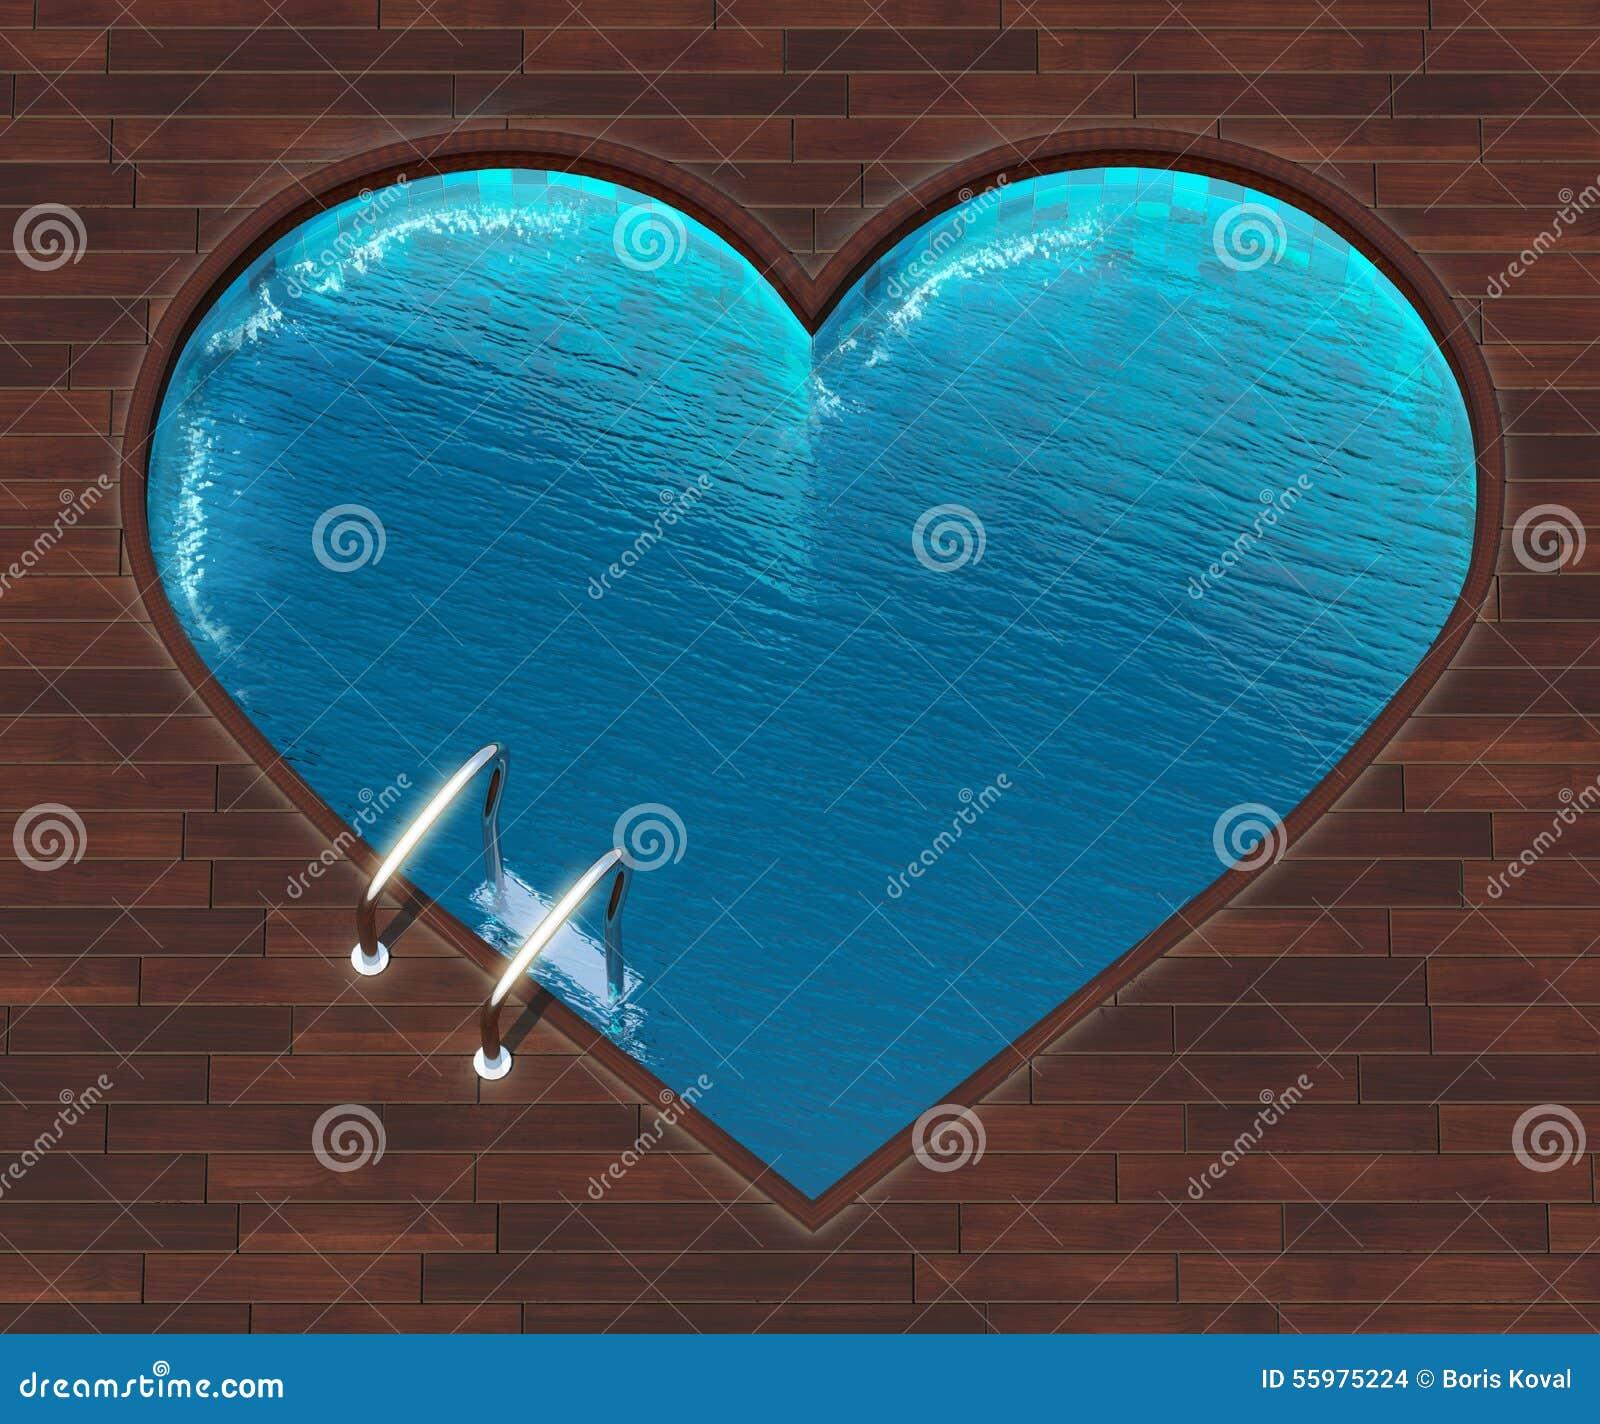 Shaped Pool Heart